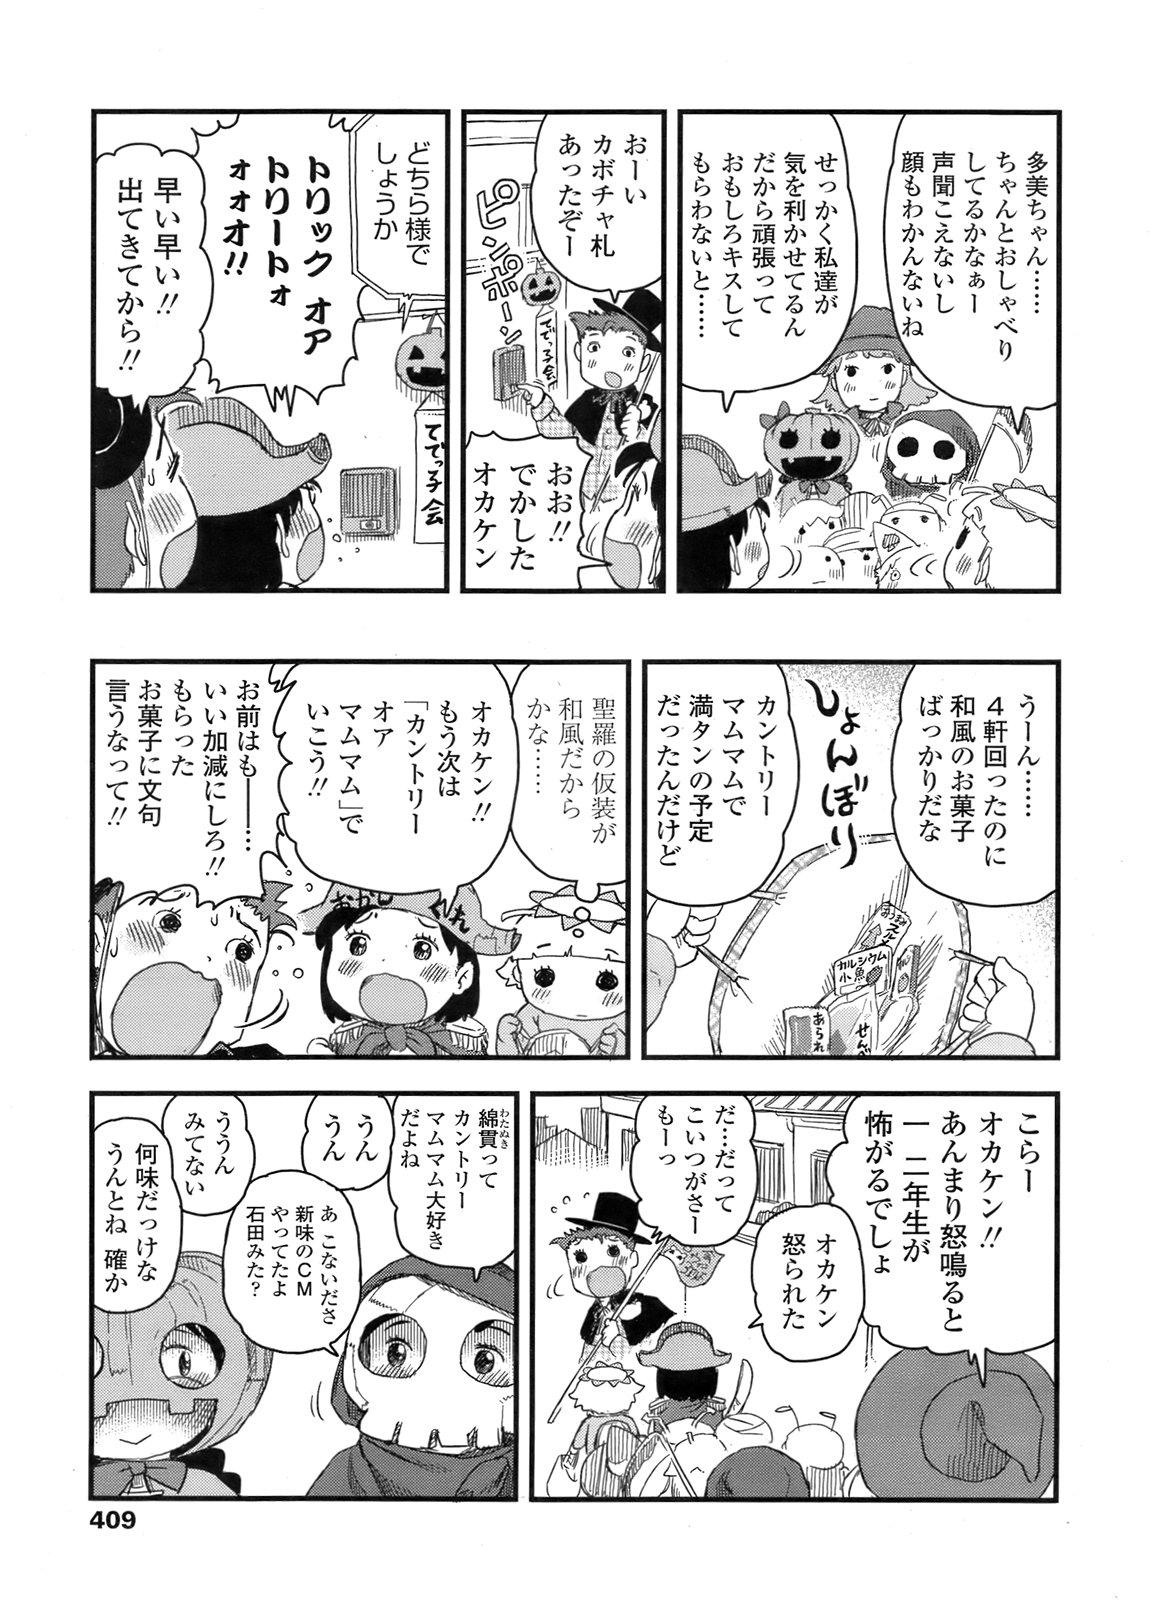 COMIC LO 2011-12 Vol. 93 409